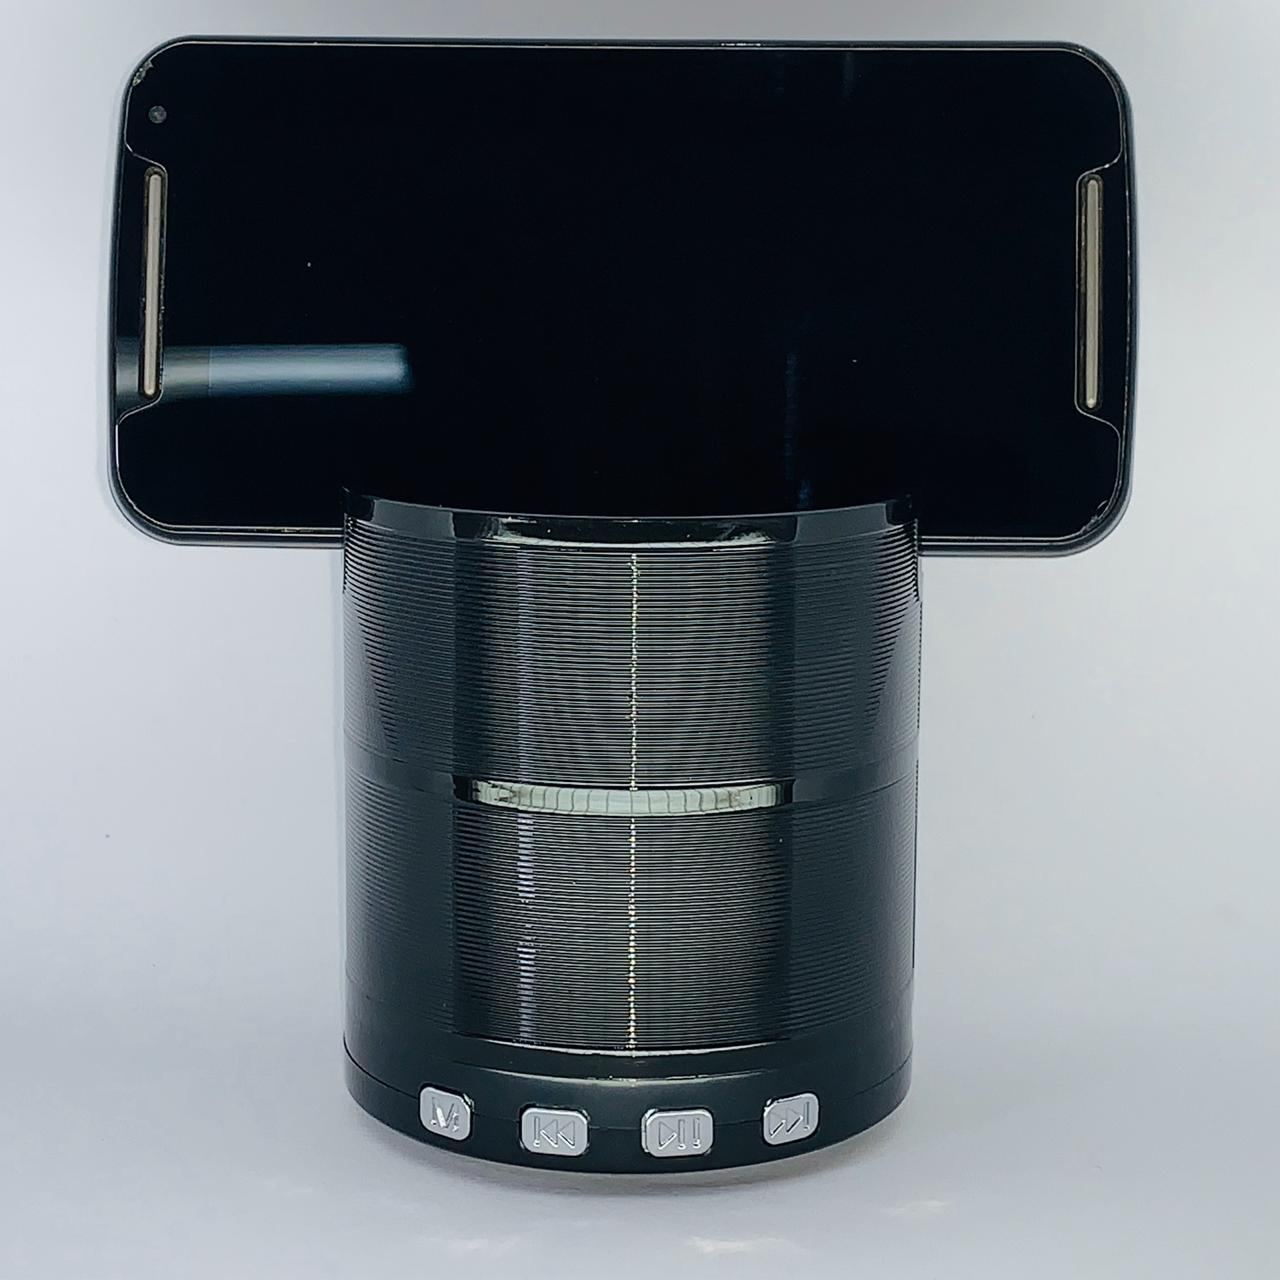 Caixa de som Hmaston WKS-128